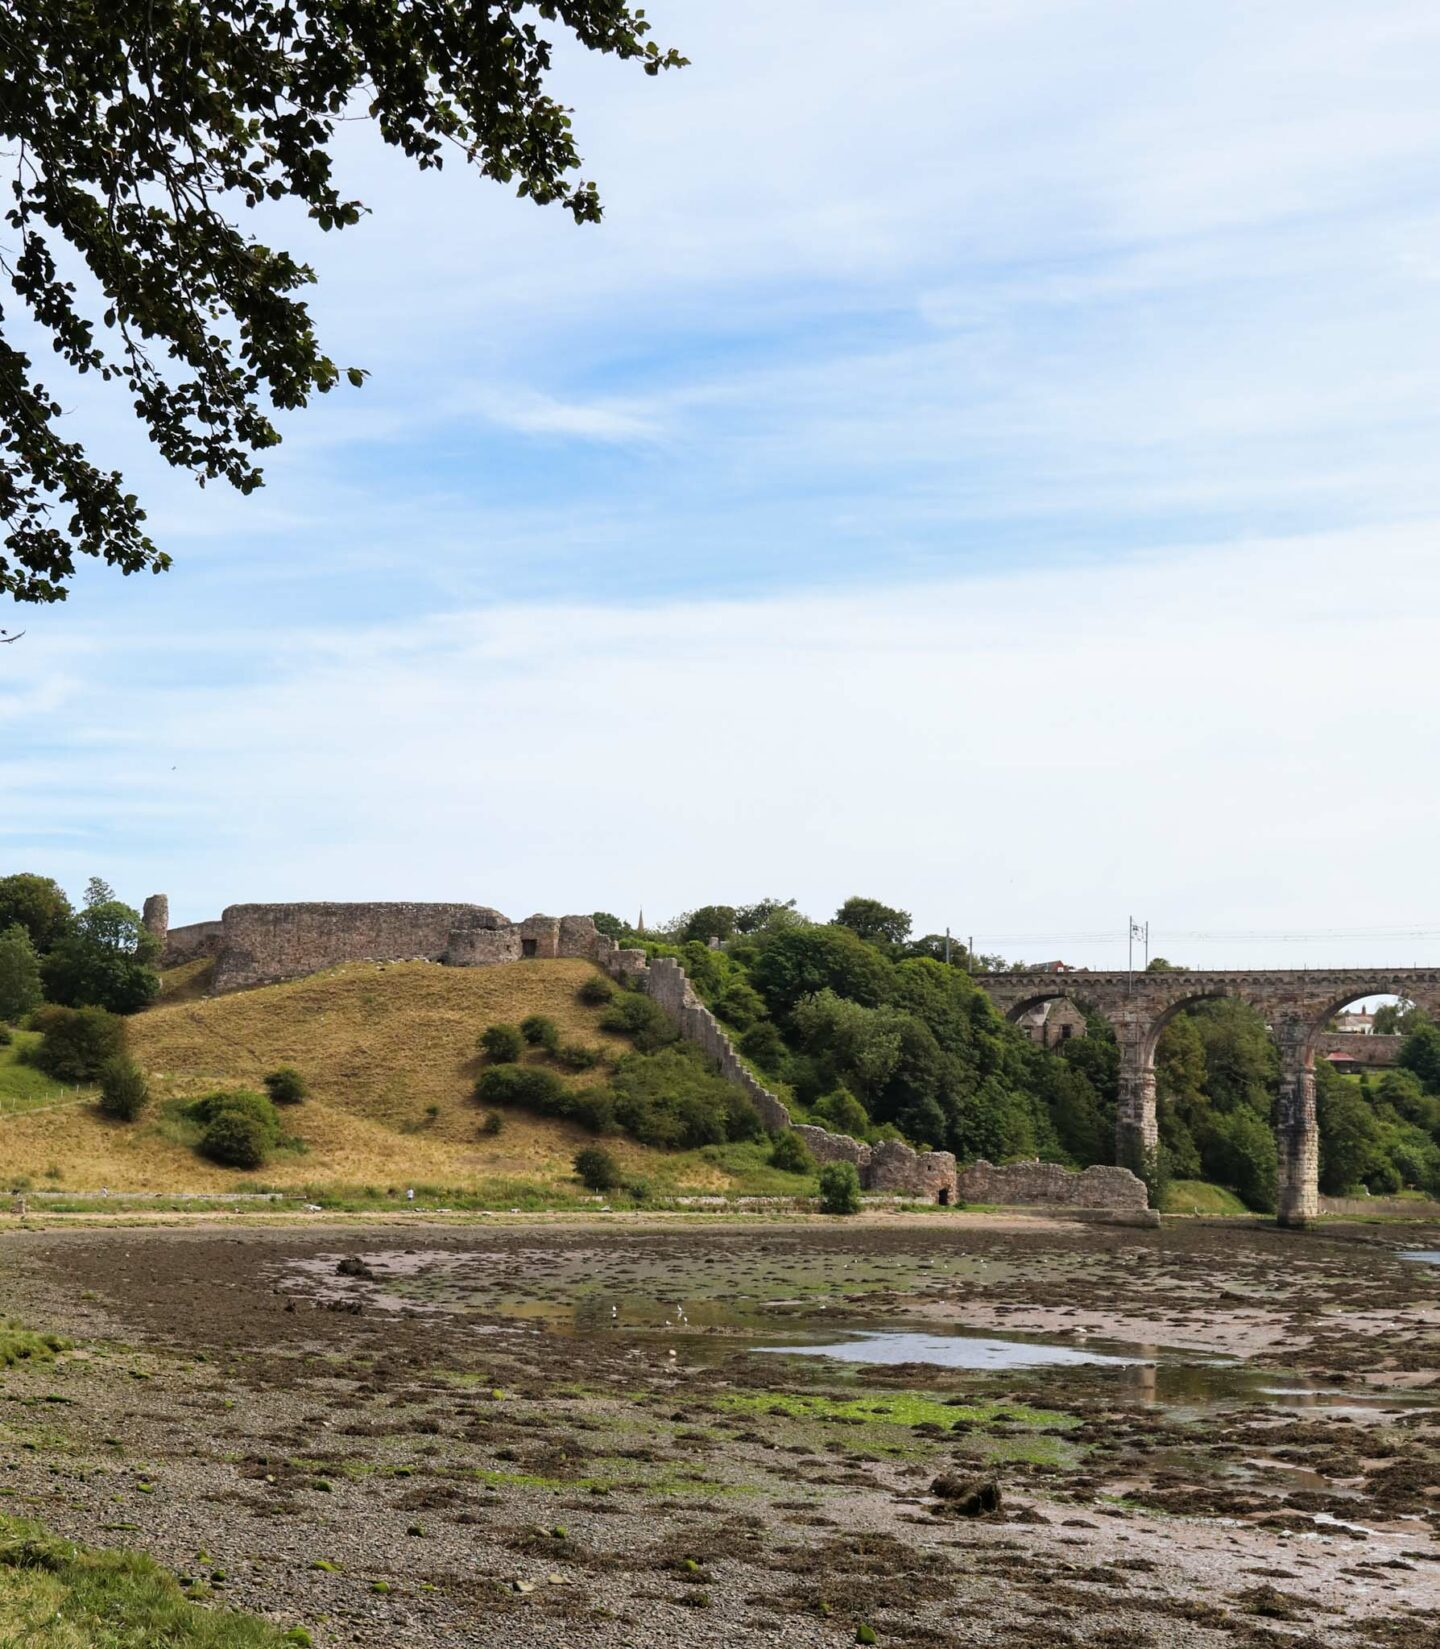 The Ruins of Berwick Castle